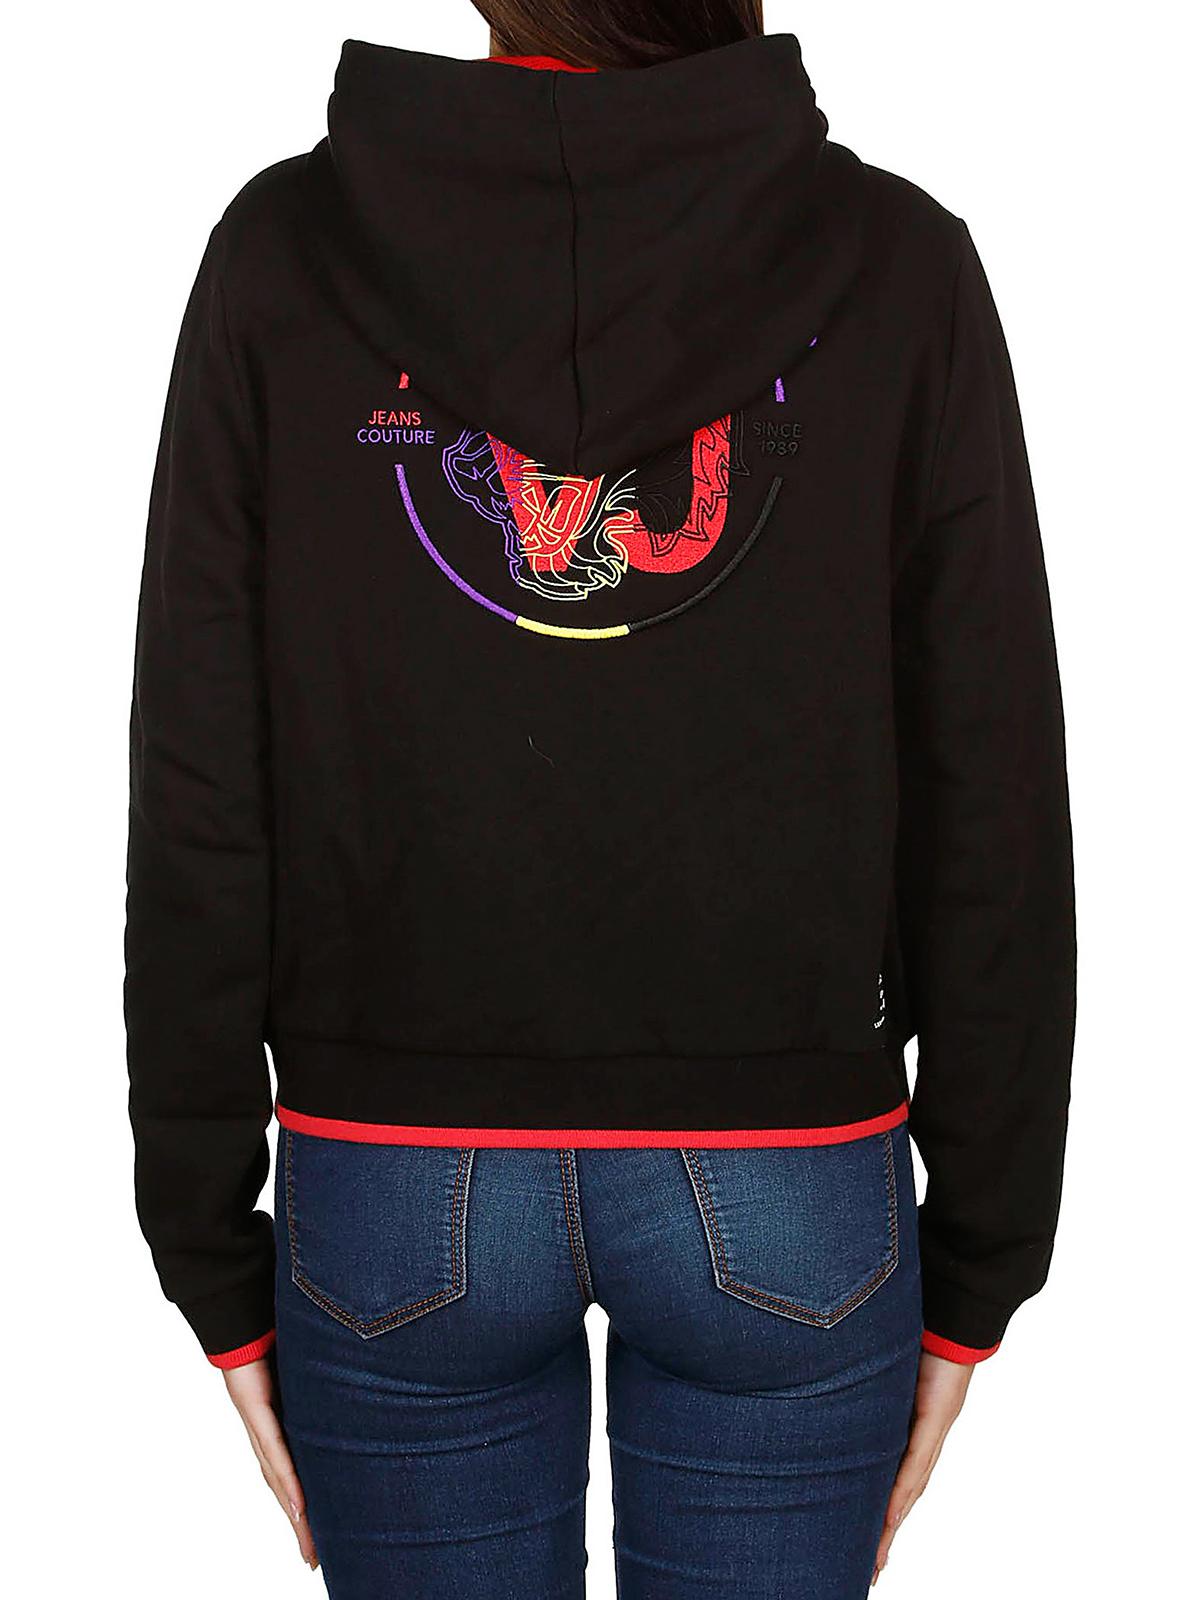 89d64f98a22 Versace Jeans - Sweat-Shirts - Noir - Sweatshirts   Pulls ...